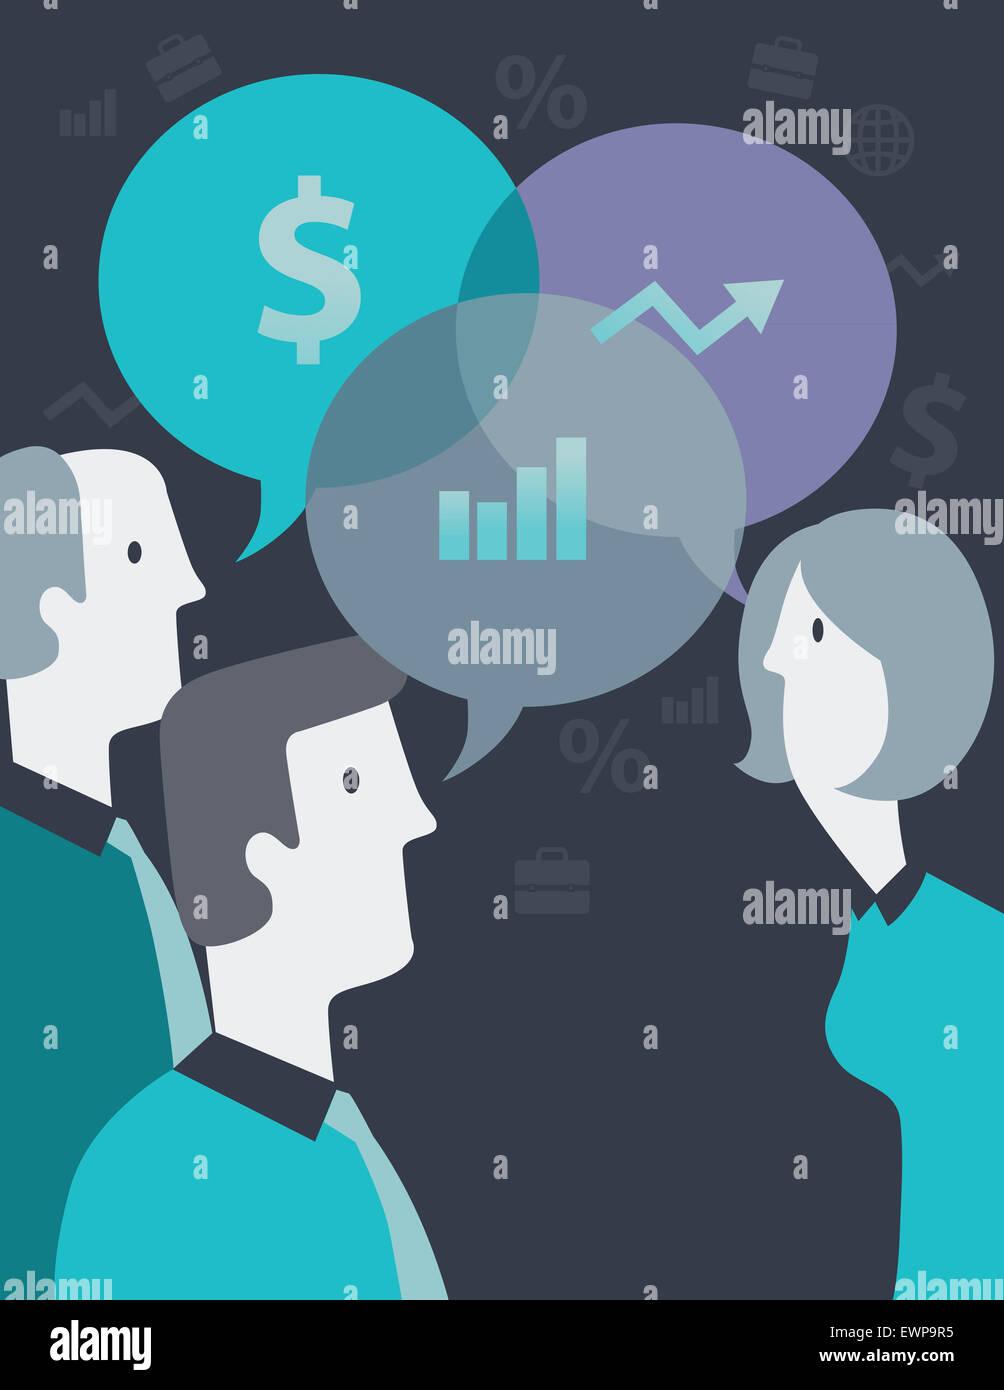 Globale Kommunikation und Vernetzung Stockbild